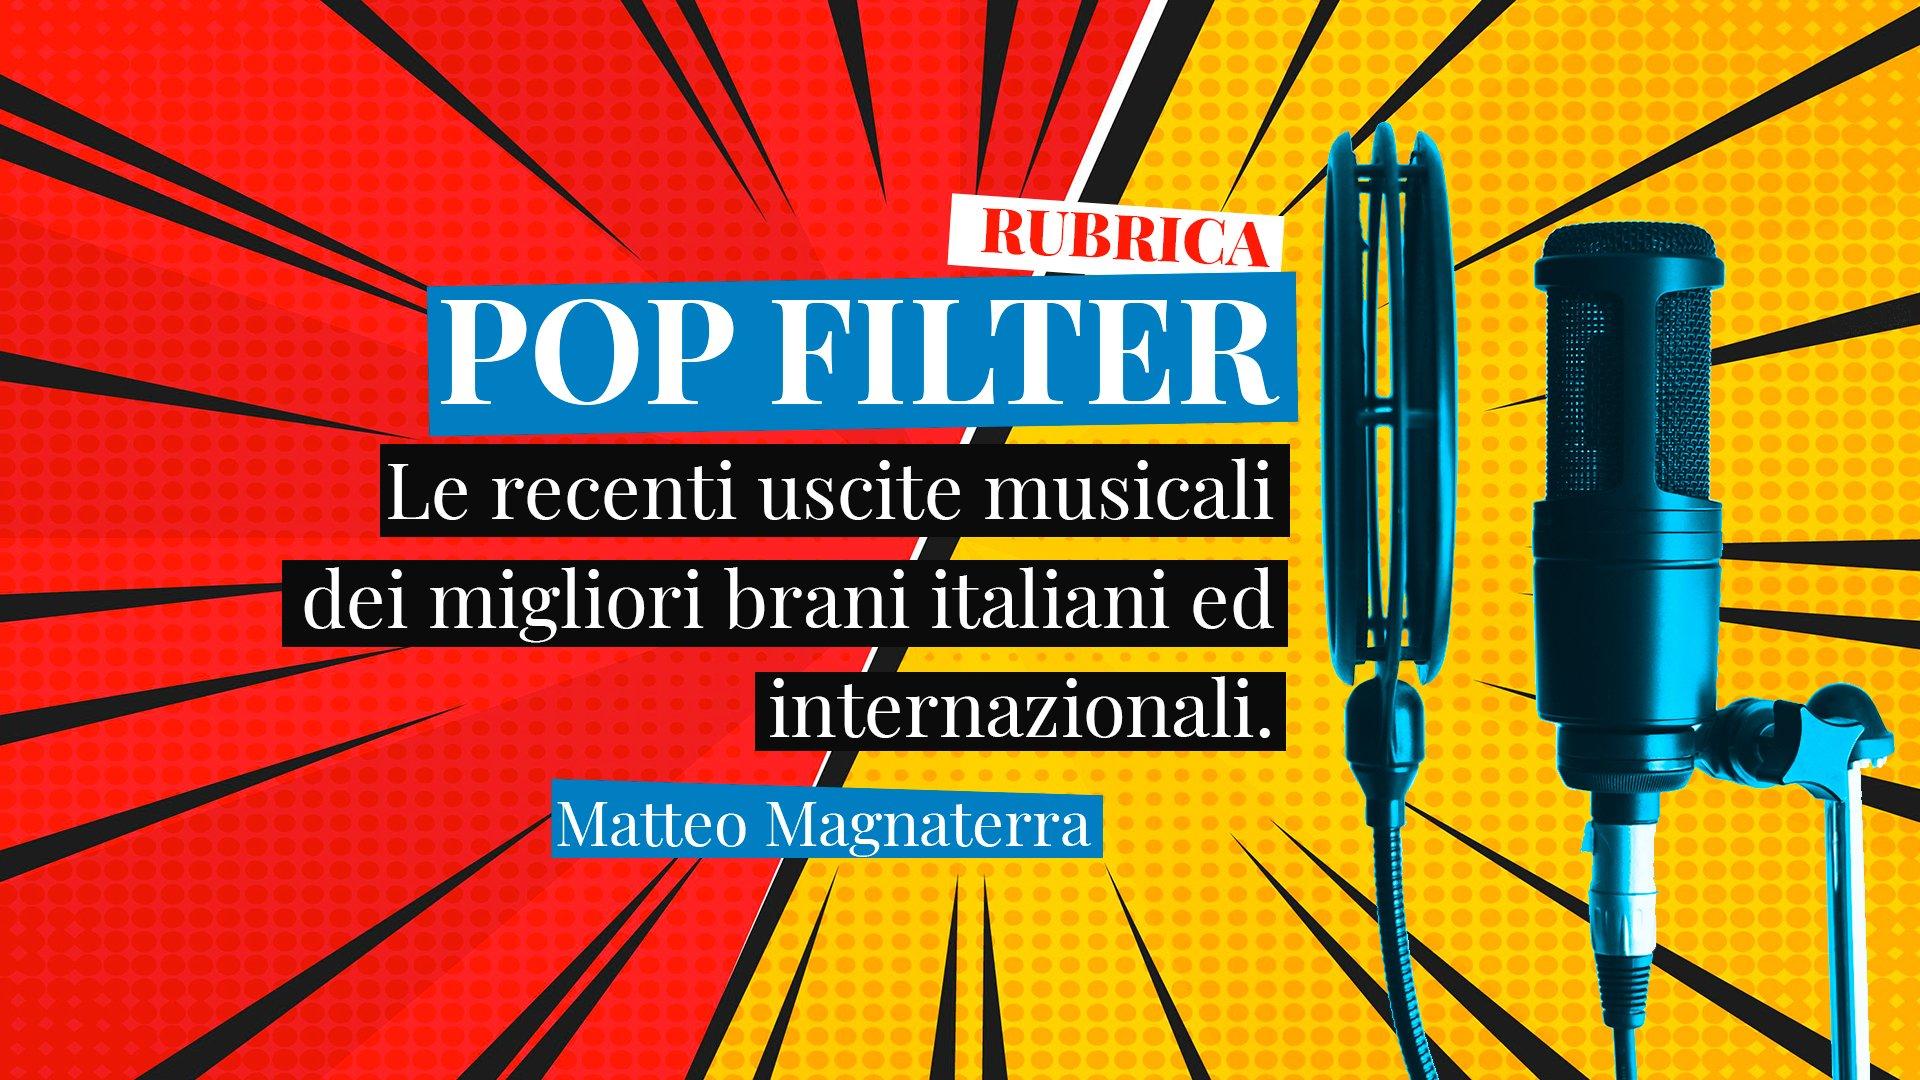 pop filter matteo magnaterra rubrica su wheremagichappens.it